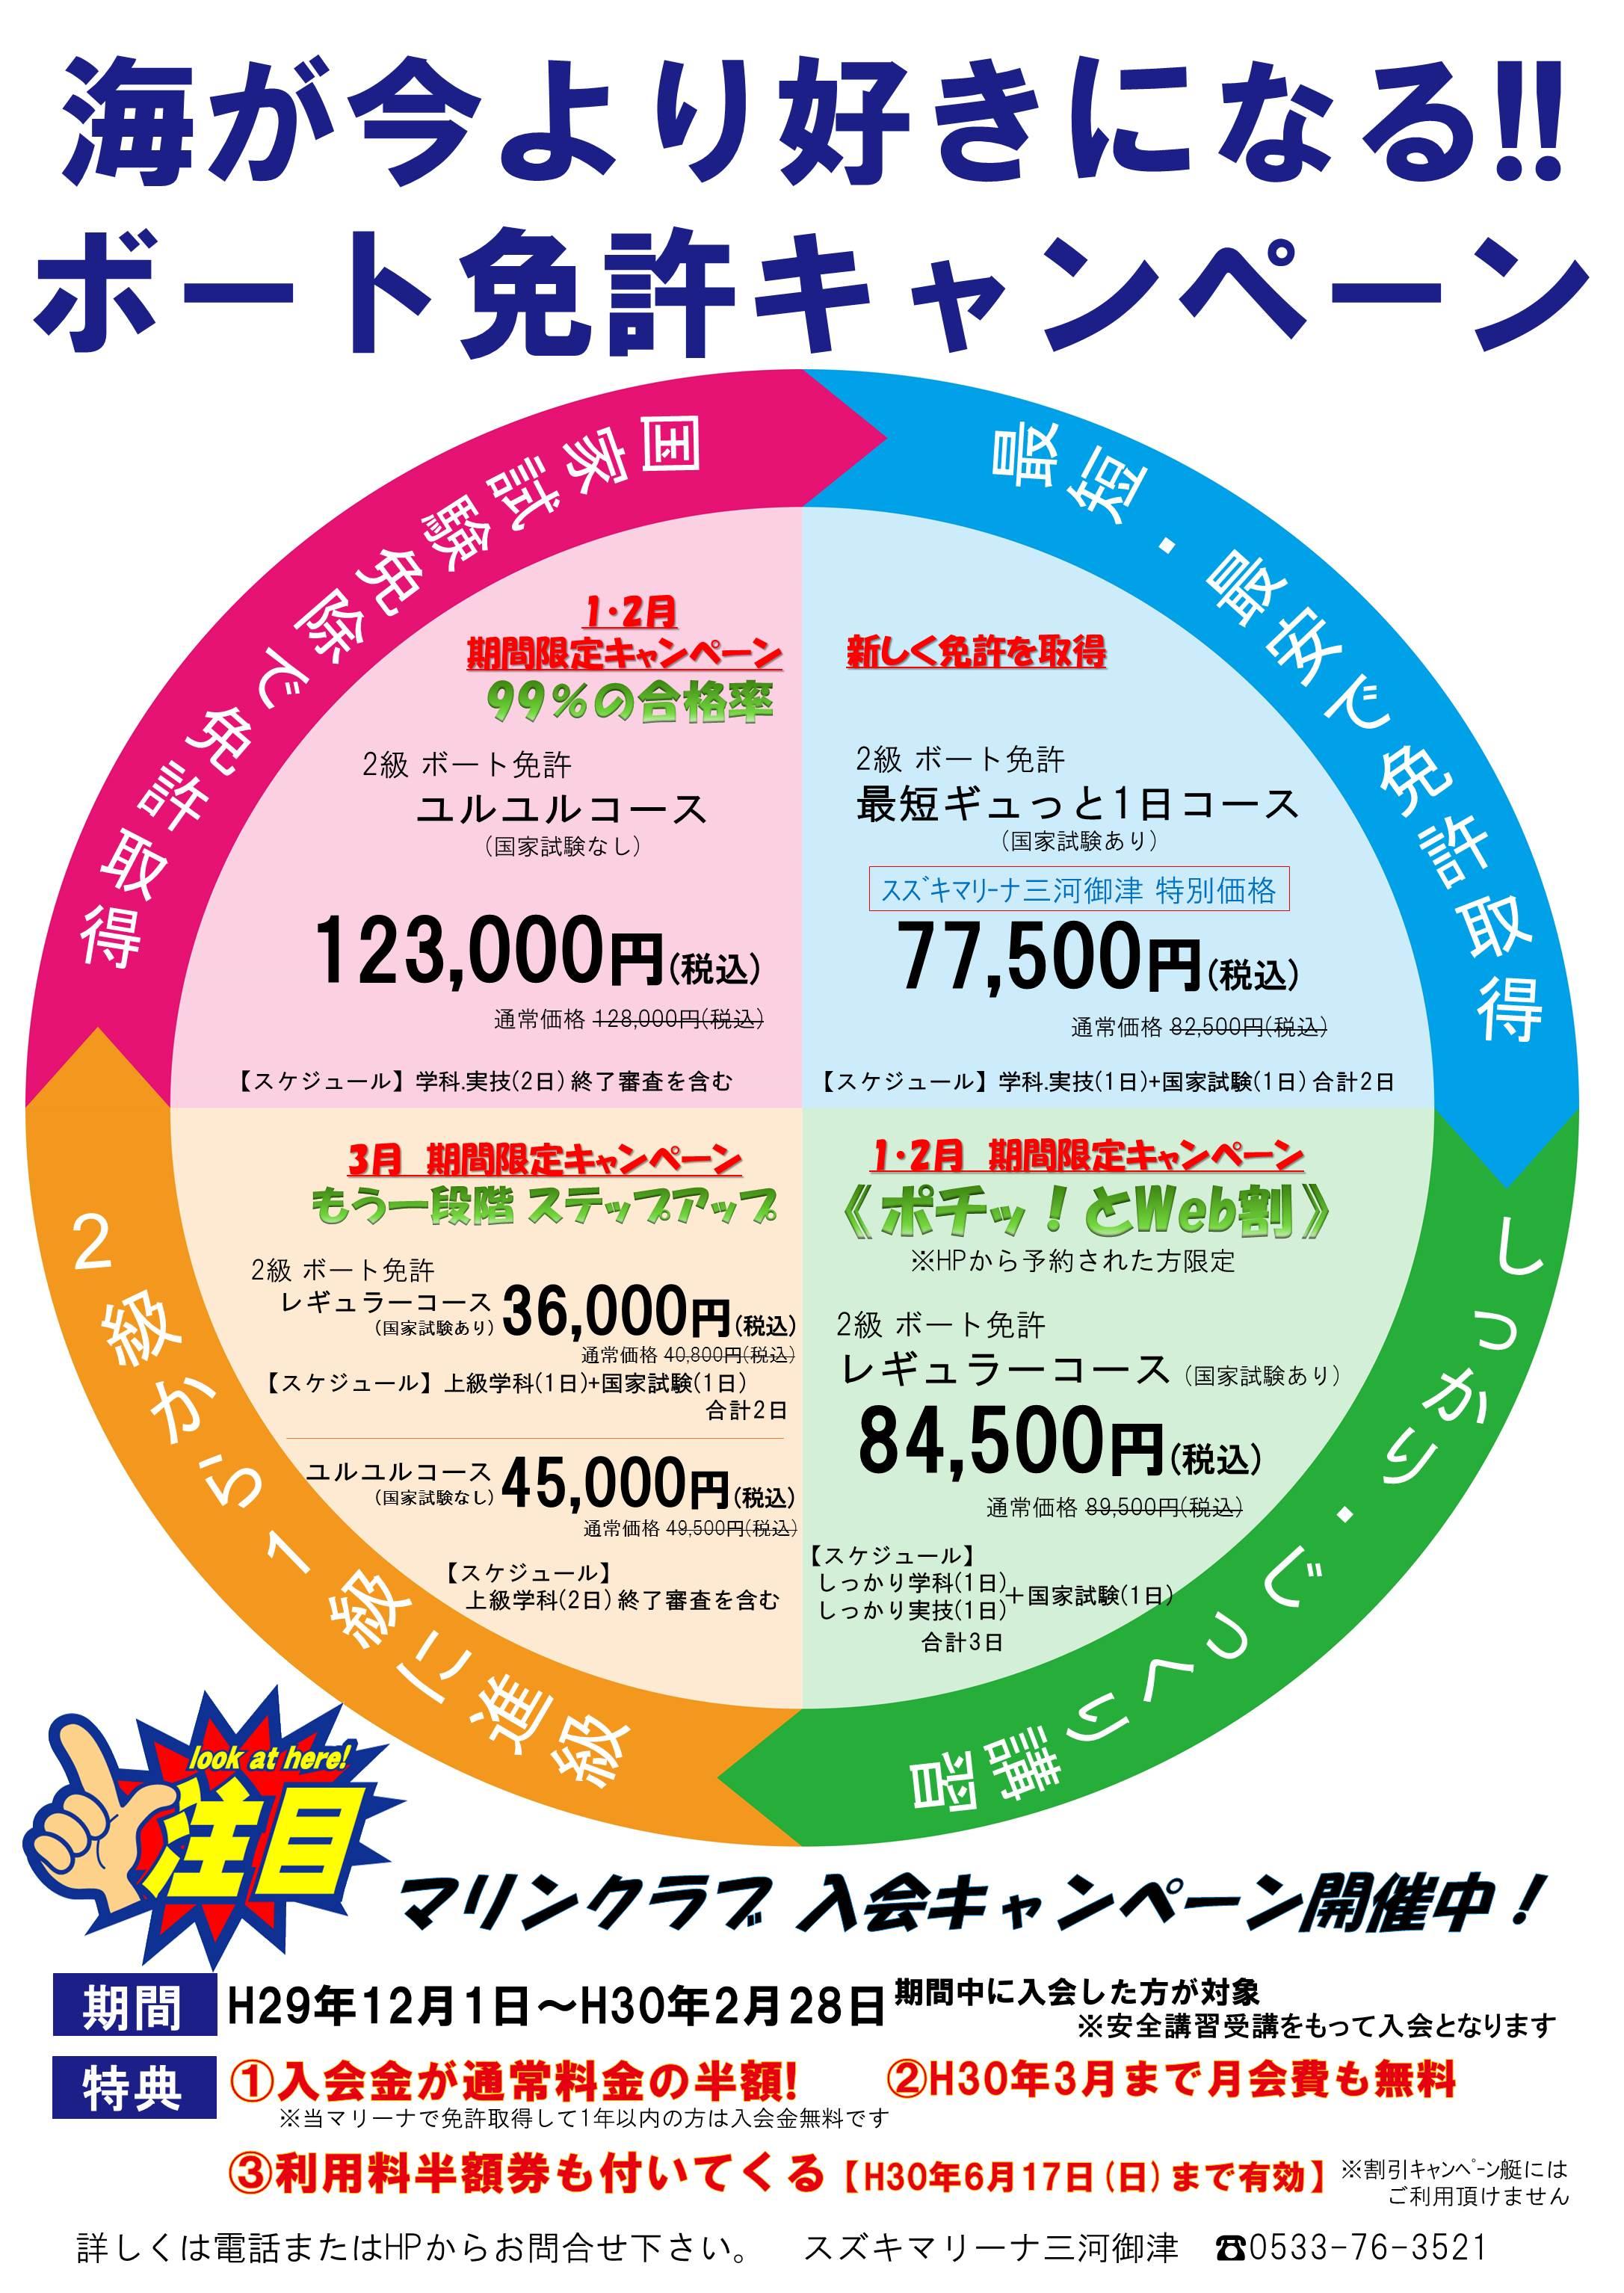 http://www.suzukimarine.co.jp/license/blog/img/%E3%80%90%E8%A3%8F%E3%80%91%EF%BE%97%EF%BD%B2%EF%BD%BC%EF%BE%9E%EF%BD%AC%EF%BD%B9%E3%80%80%E5%85%8D%E8%A8%B1.jpg